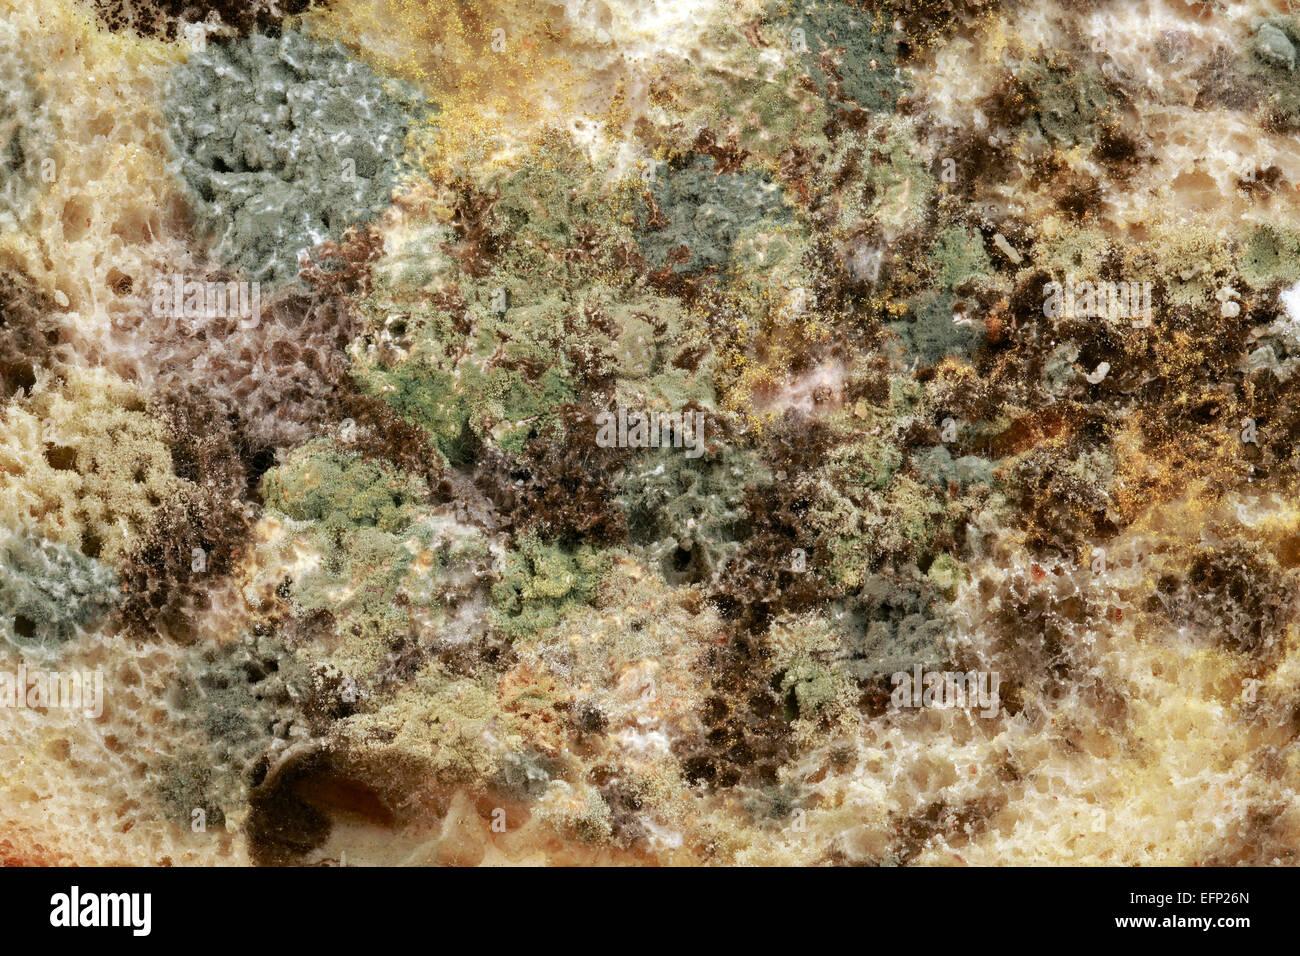 toxic mold stockfotos toxic mold bilder alamy. Black Bedroom Furniture Sets. Home Design Ideas